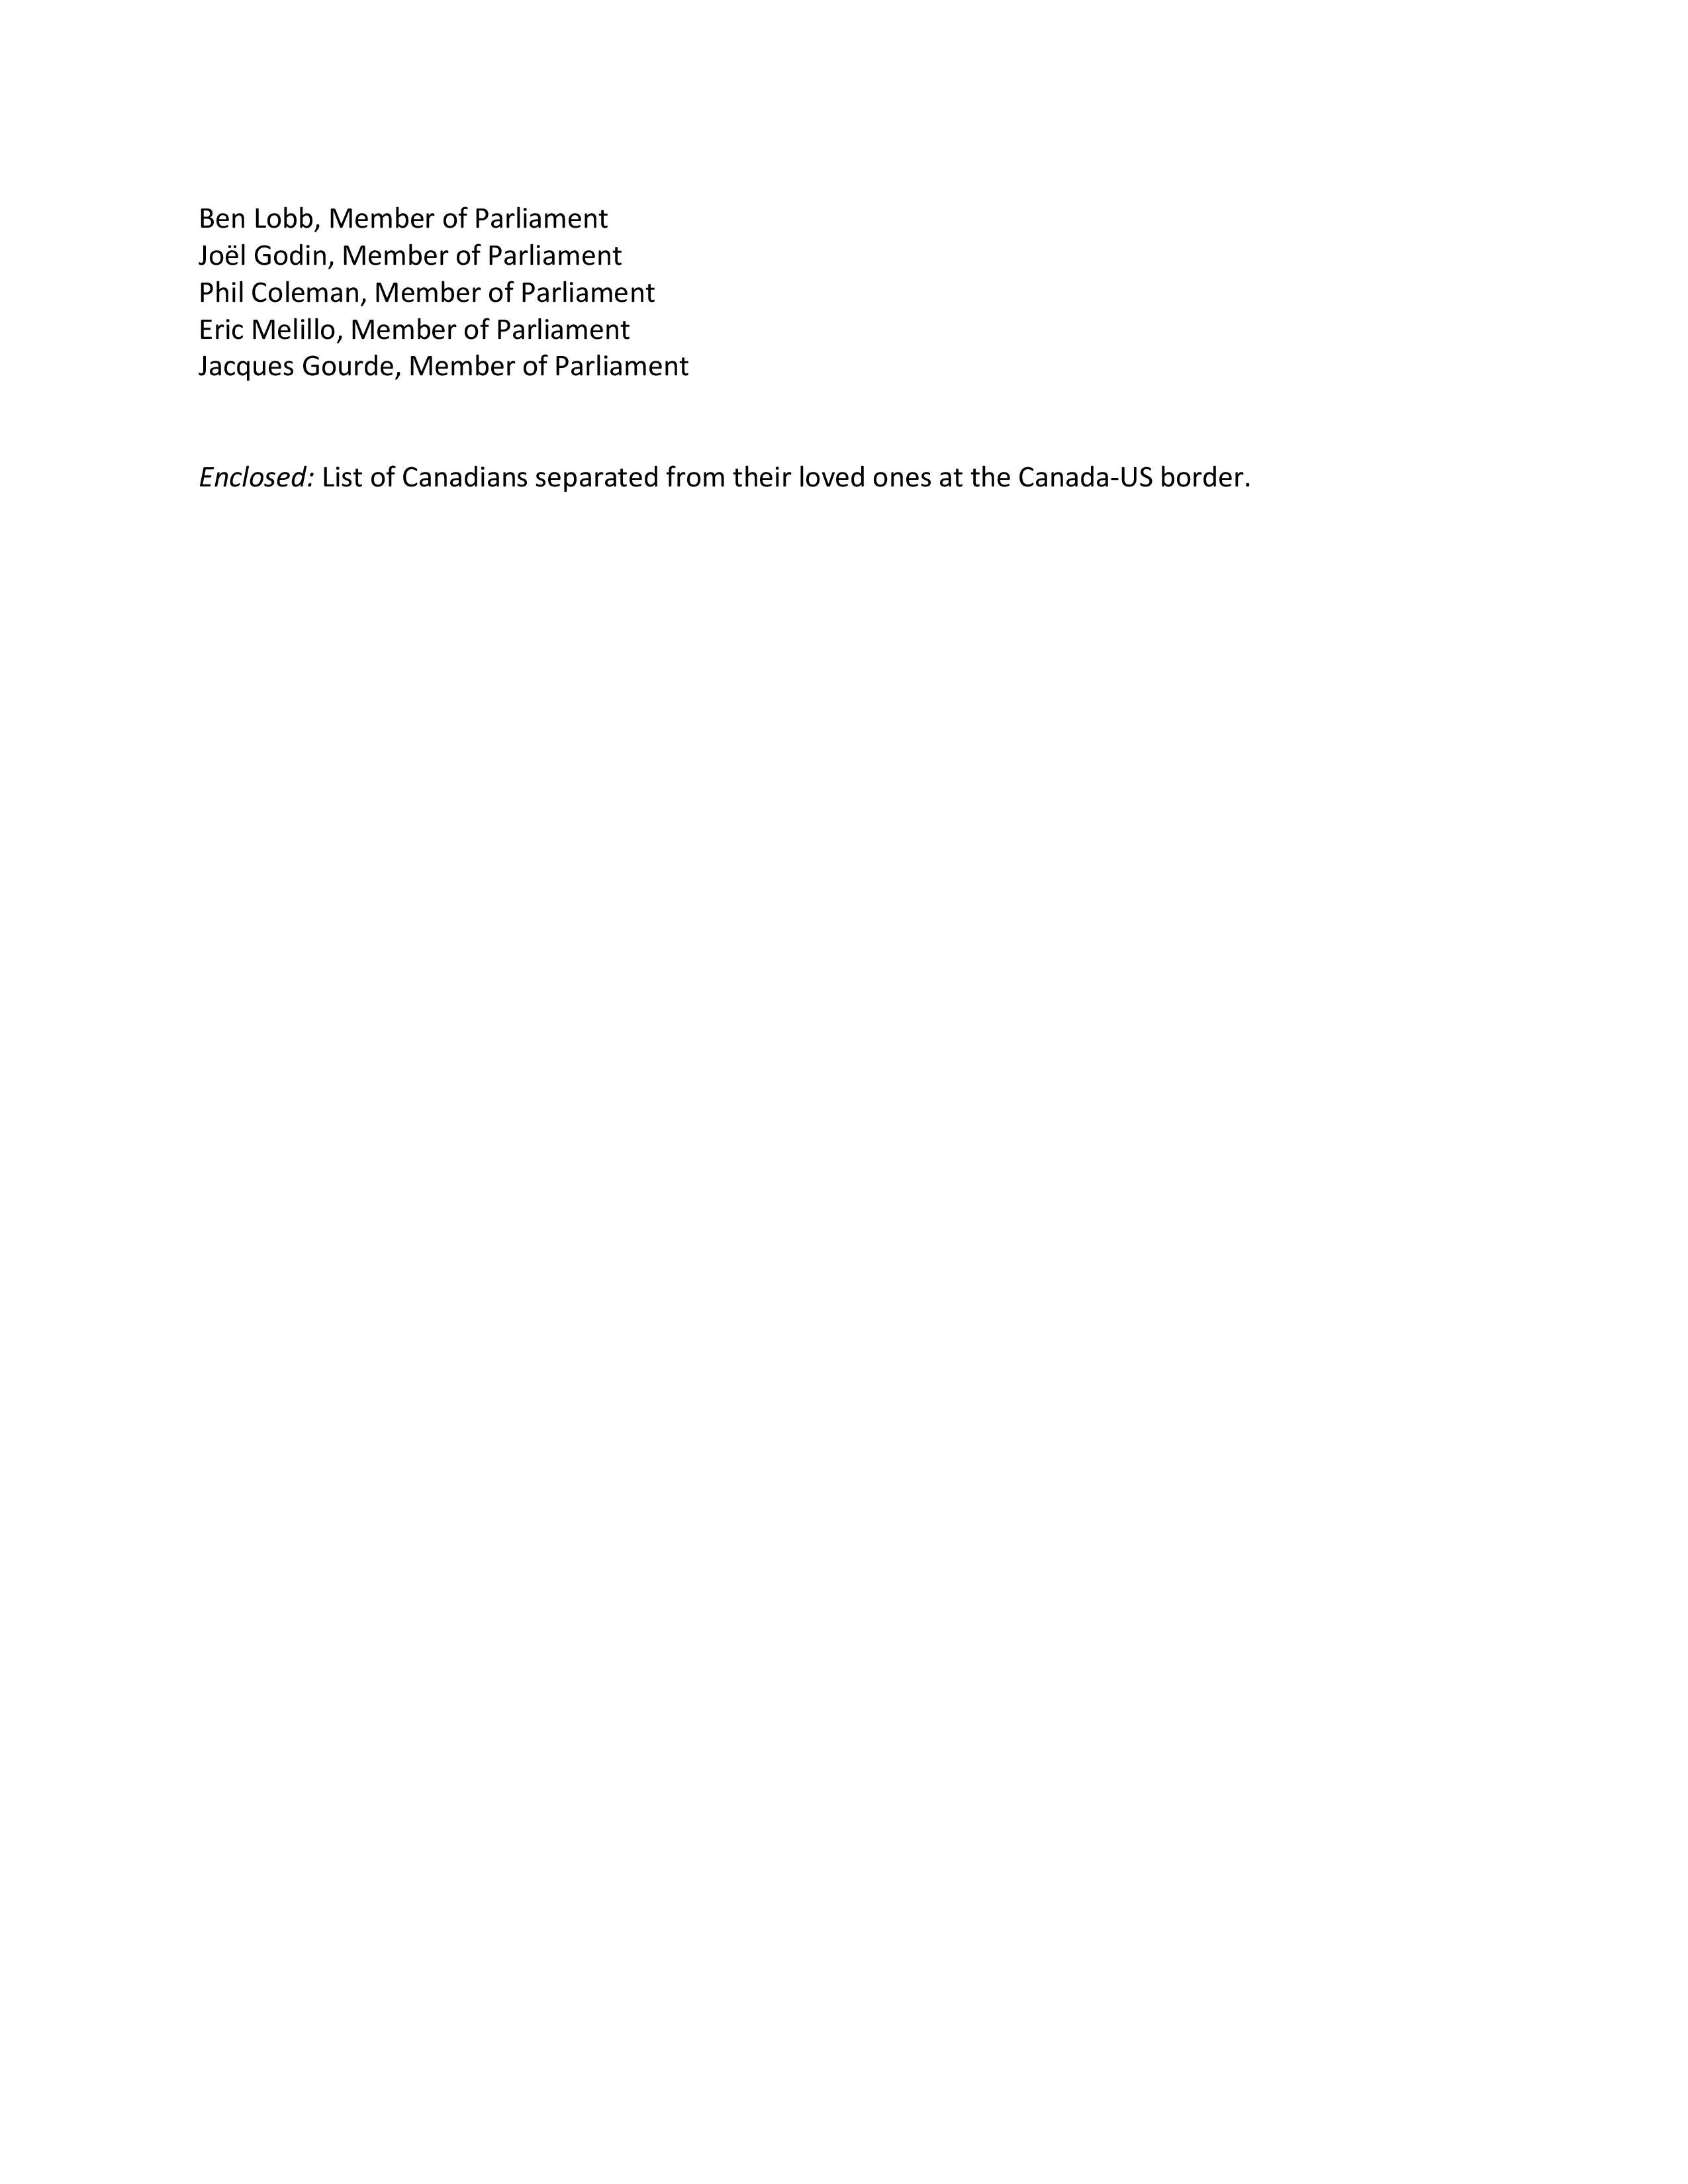 Letter_Minister_Blair_-_02_06_2020_E-page-003.jpg